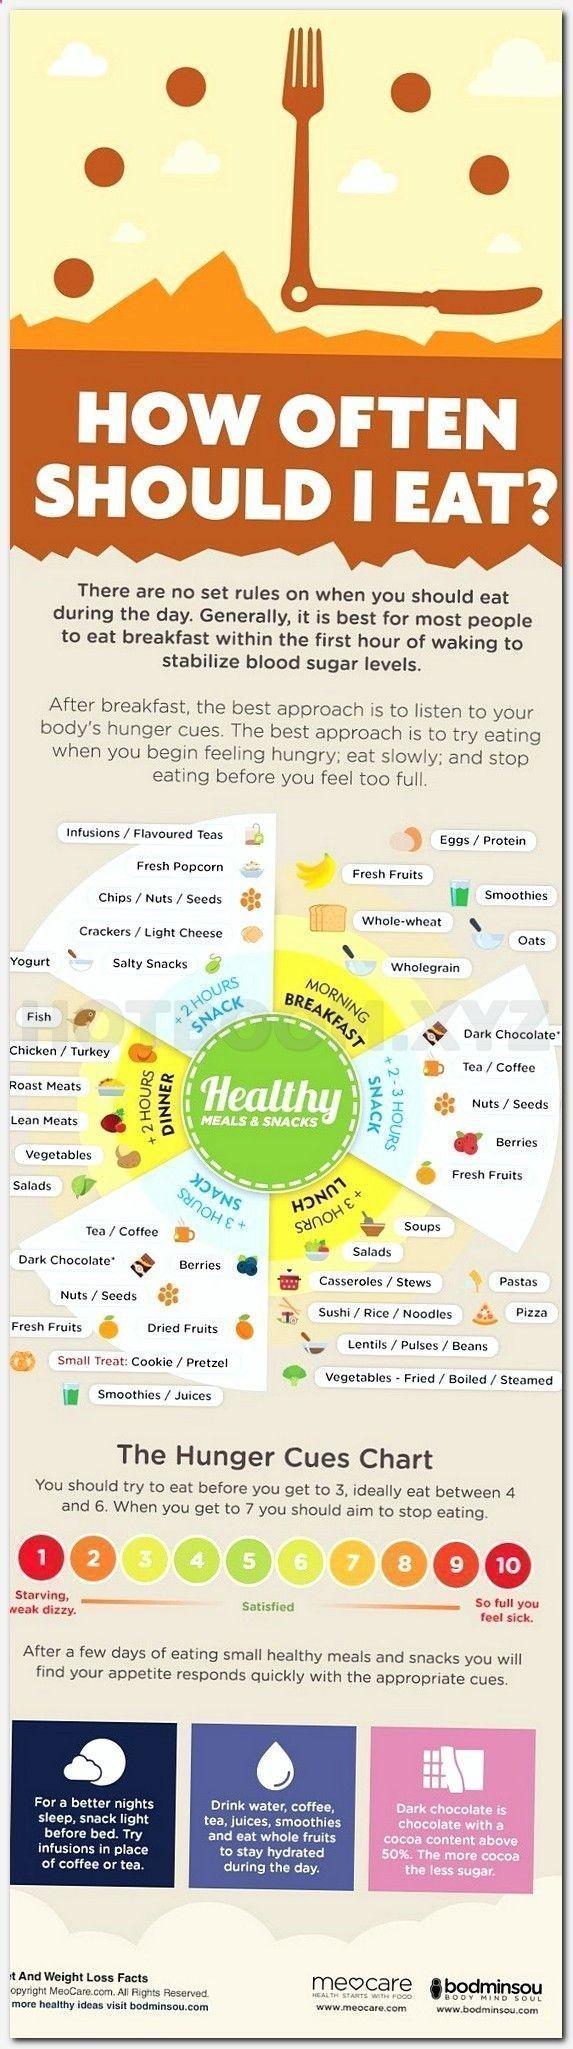 how to start a detox diet